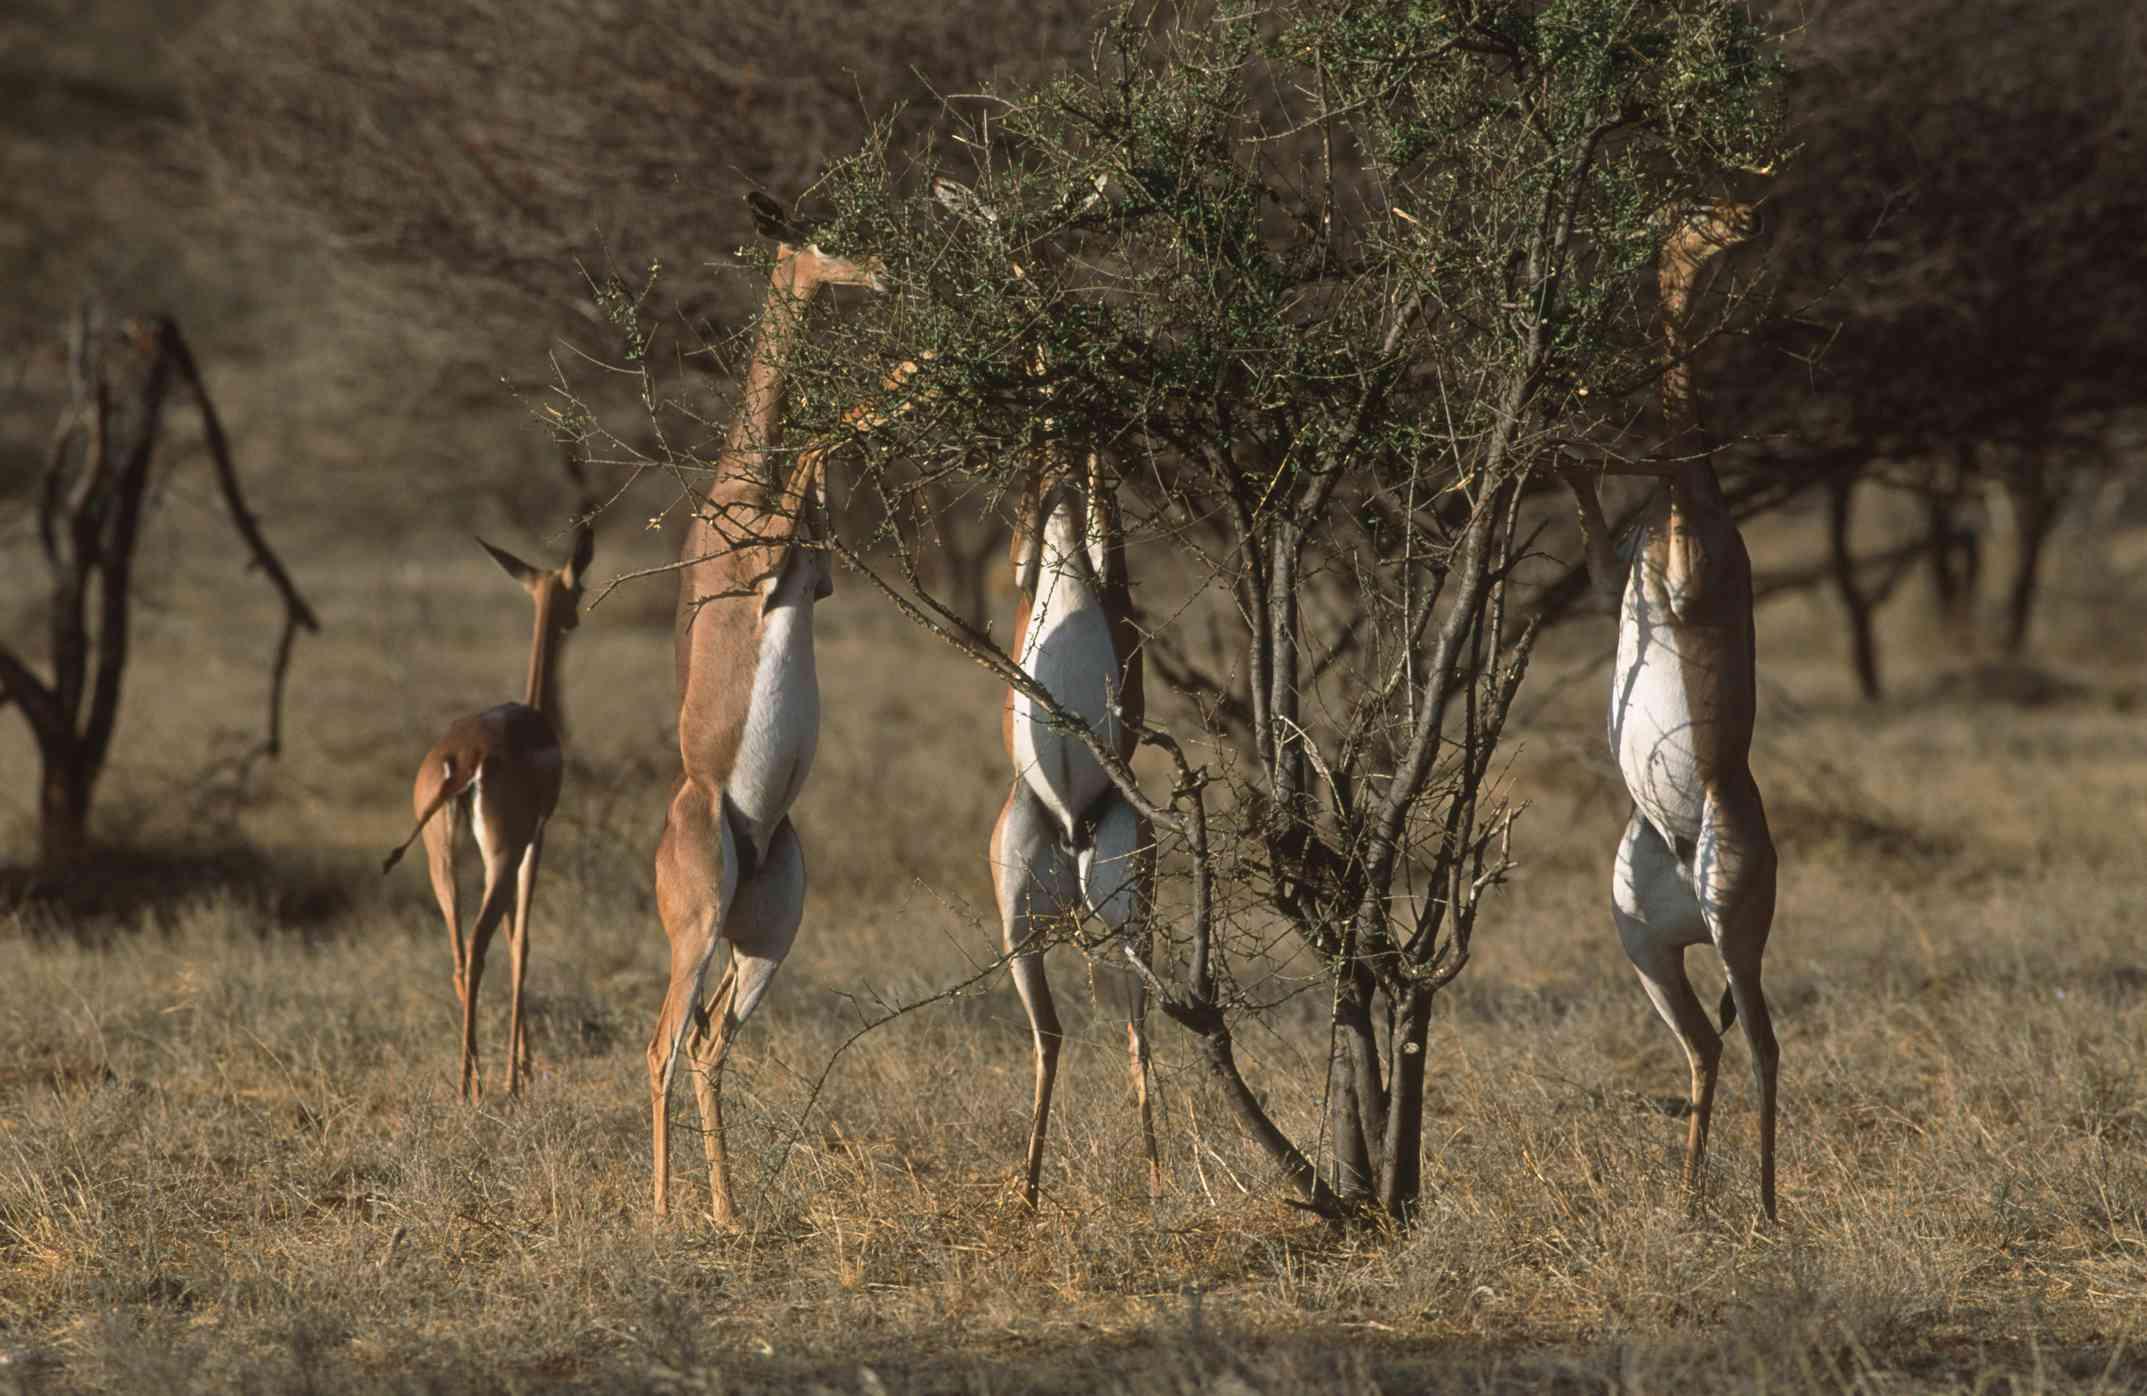 Gerenuks (Litocranius walleri) feeding on bushes in a forest, Samburu National Reserve, Kenya